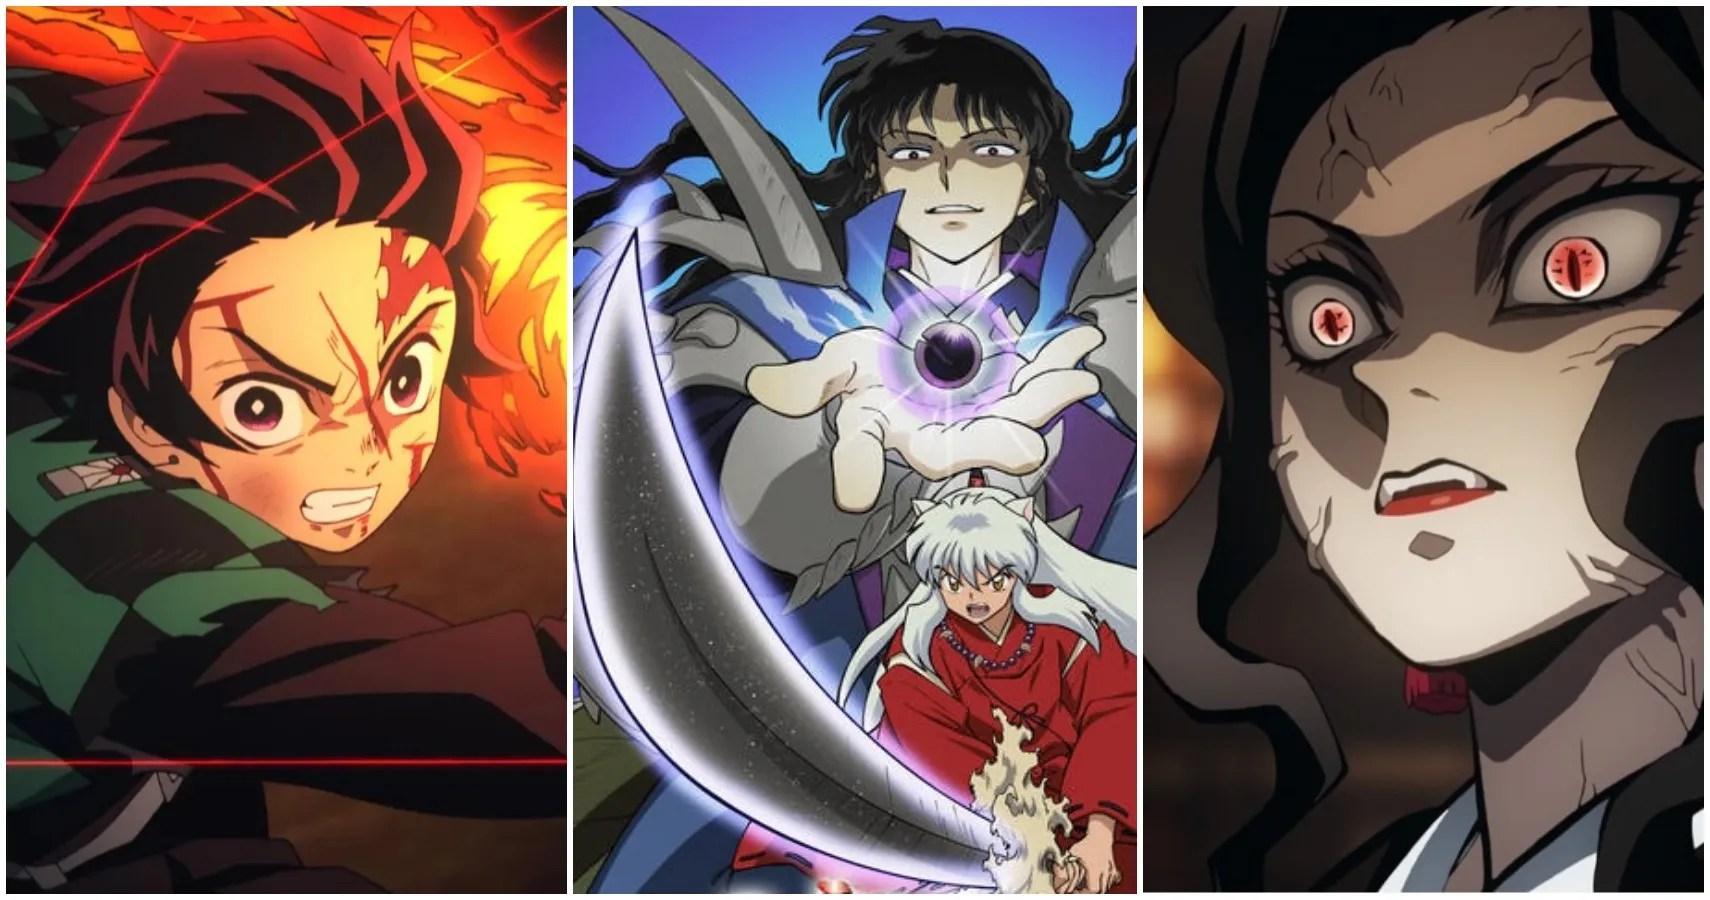 Demon slayer, kimetsu no yaiba, fire hashira demon slayer, slayer anime, anime. Demon Slayer: 5 Famous Manga That Influenced It (& 5 That ...